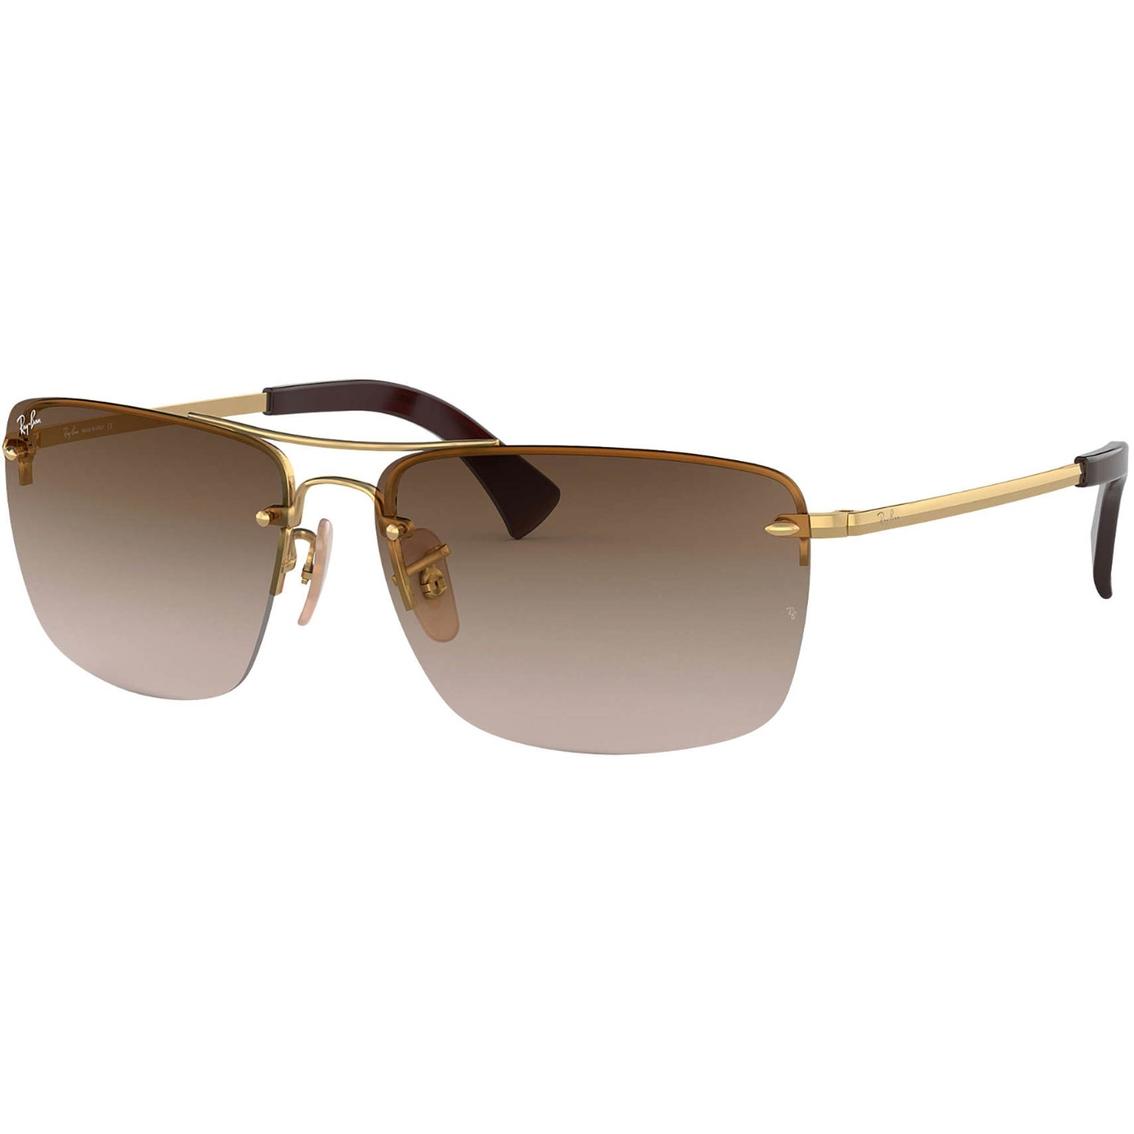 2b049c7ce25cc8 Ray Ban Rectangle Gradient Sunglasses 0rb360700113 | Men's ...